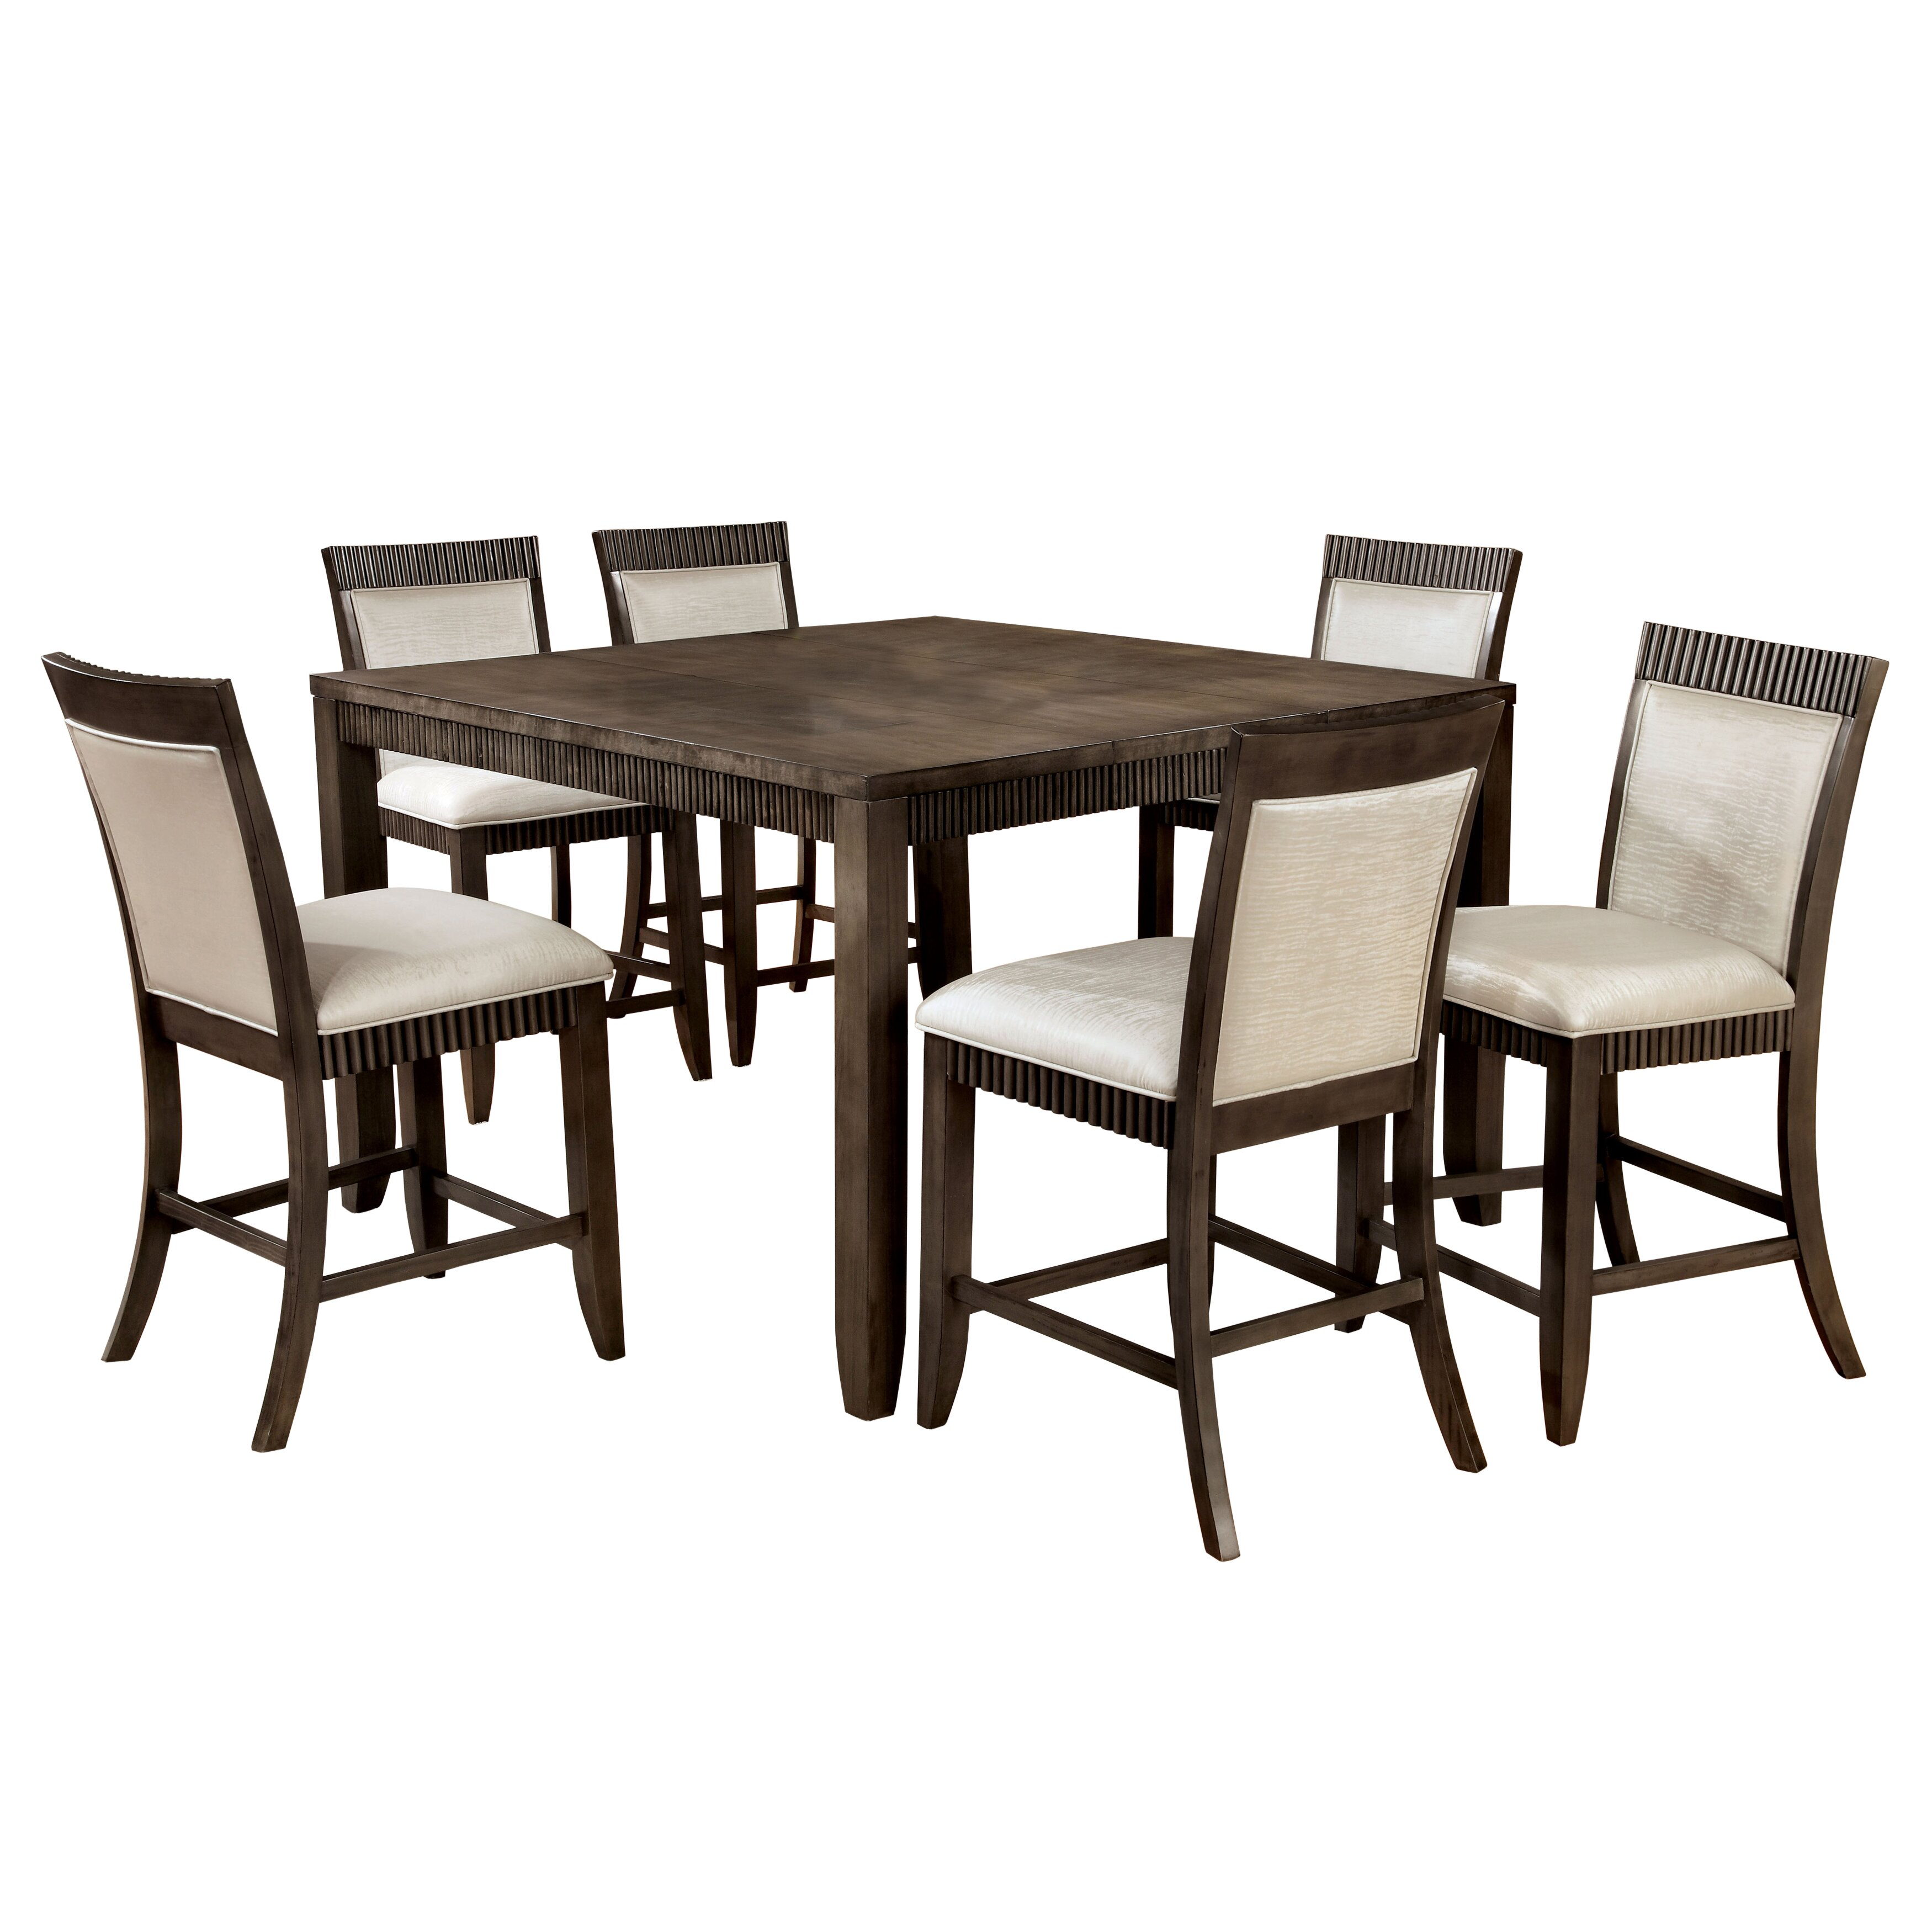 Hokku designs gayet 7 piece counter height dining set for Hokku designs dining room furniture